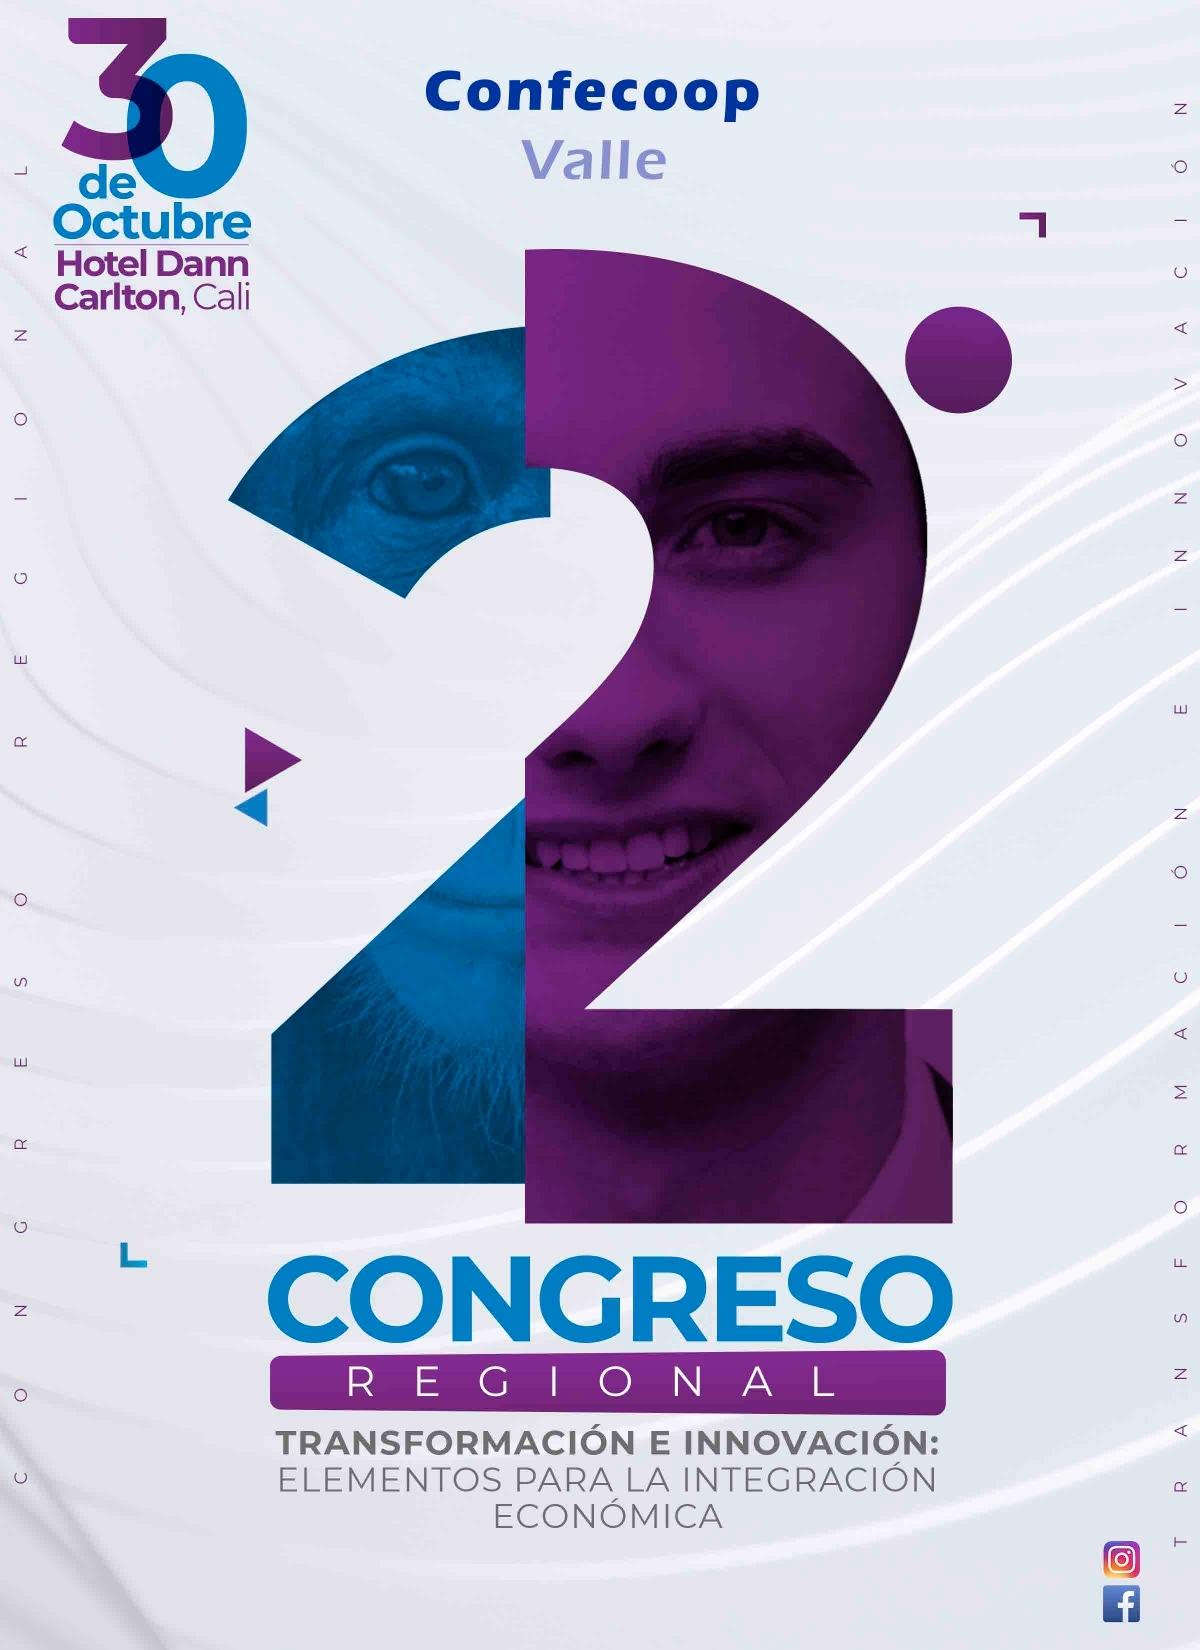 Confecoop Valle Congreso regional